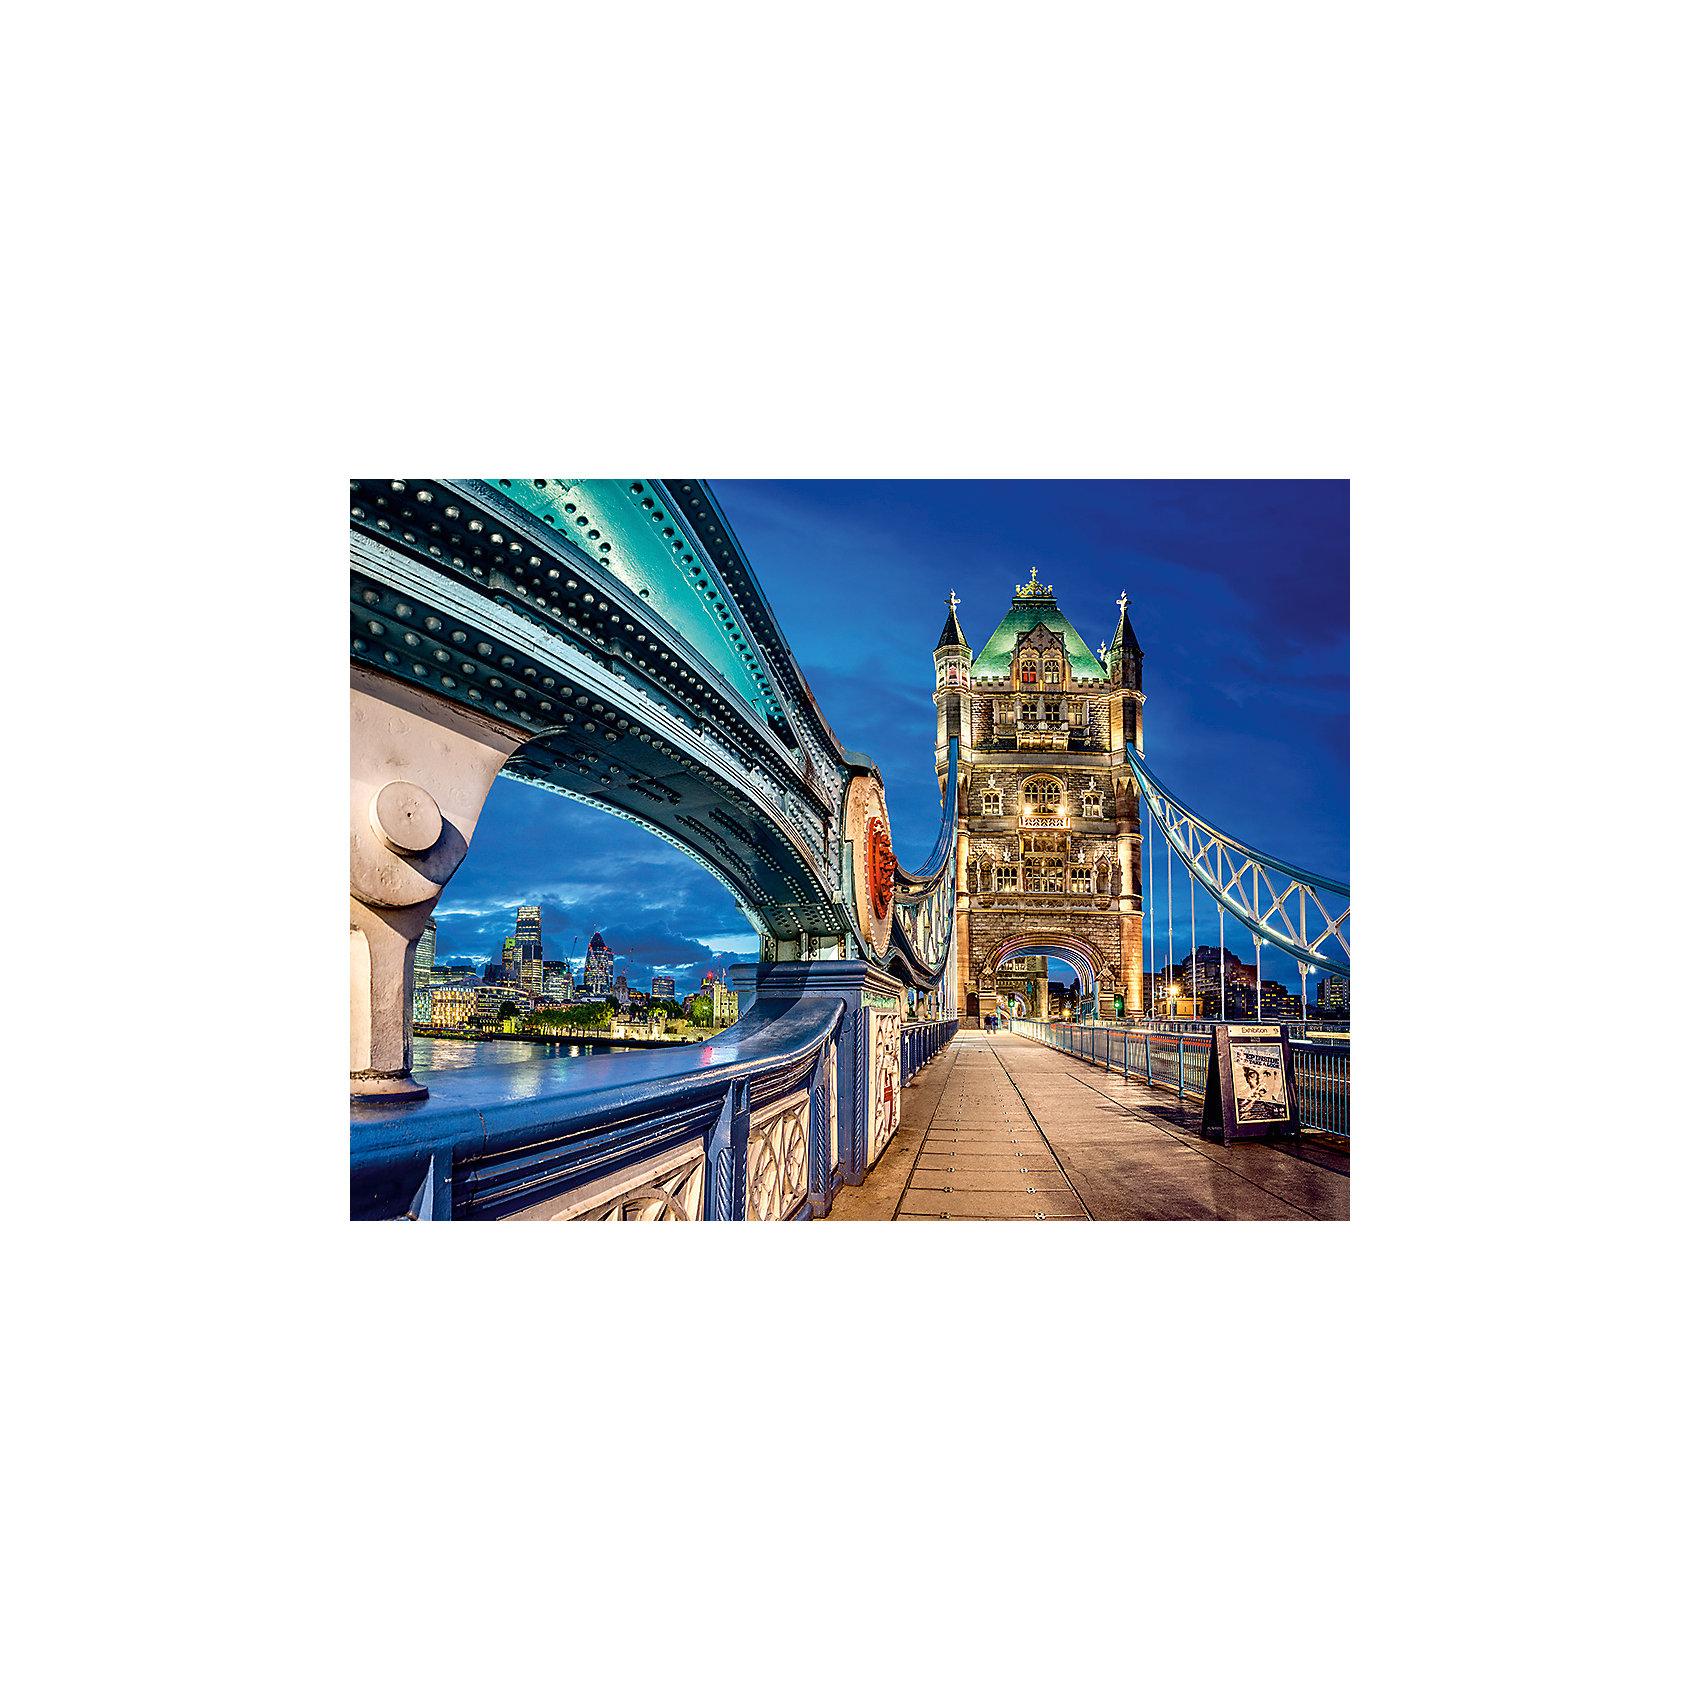 Пазл Тауэрский мост, 2000 деталей, Castorland<br><br>Ширина мм: 385<br>Глубина мм: 50<br>Высота мм: 275<br>Вес г: 1000<br>Возраст от месяцев: 144<br>Возраст до месяцев: 1188<br>Пол: Унисекс<br>Возраст: Детский<br>SKU: 4879207